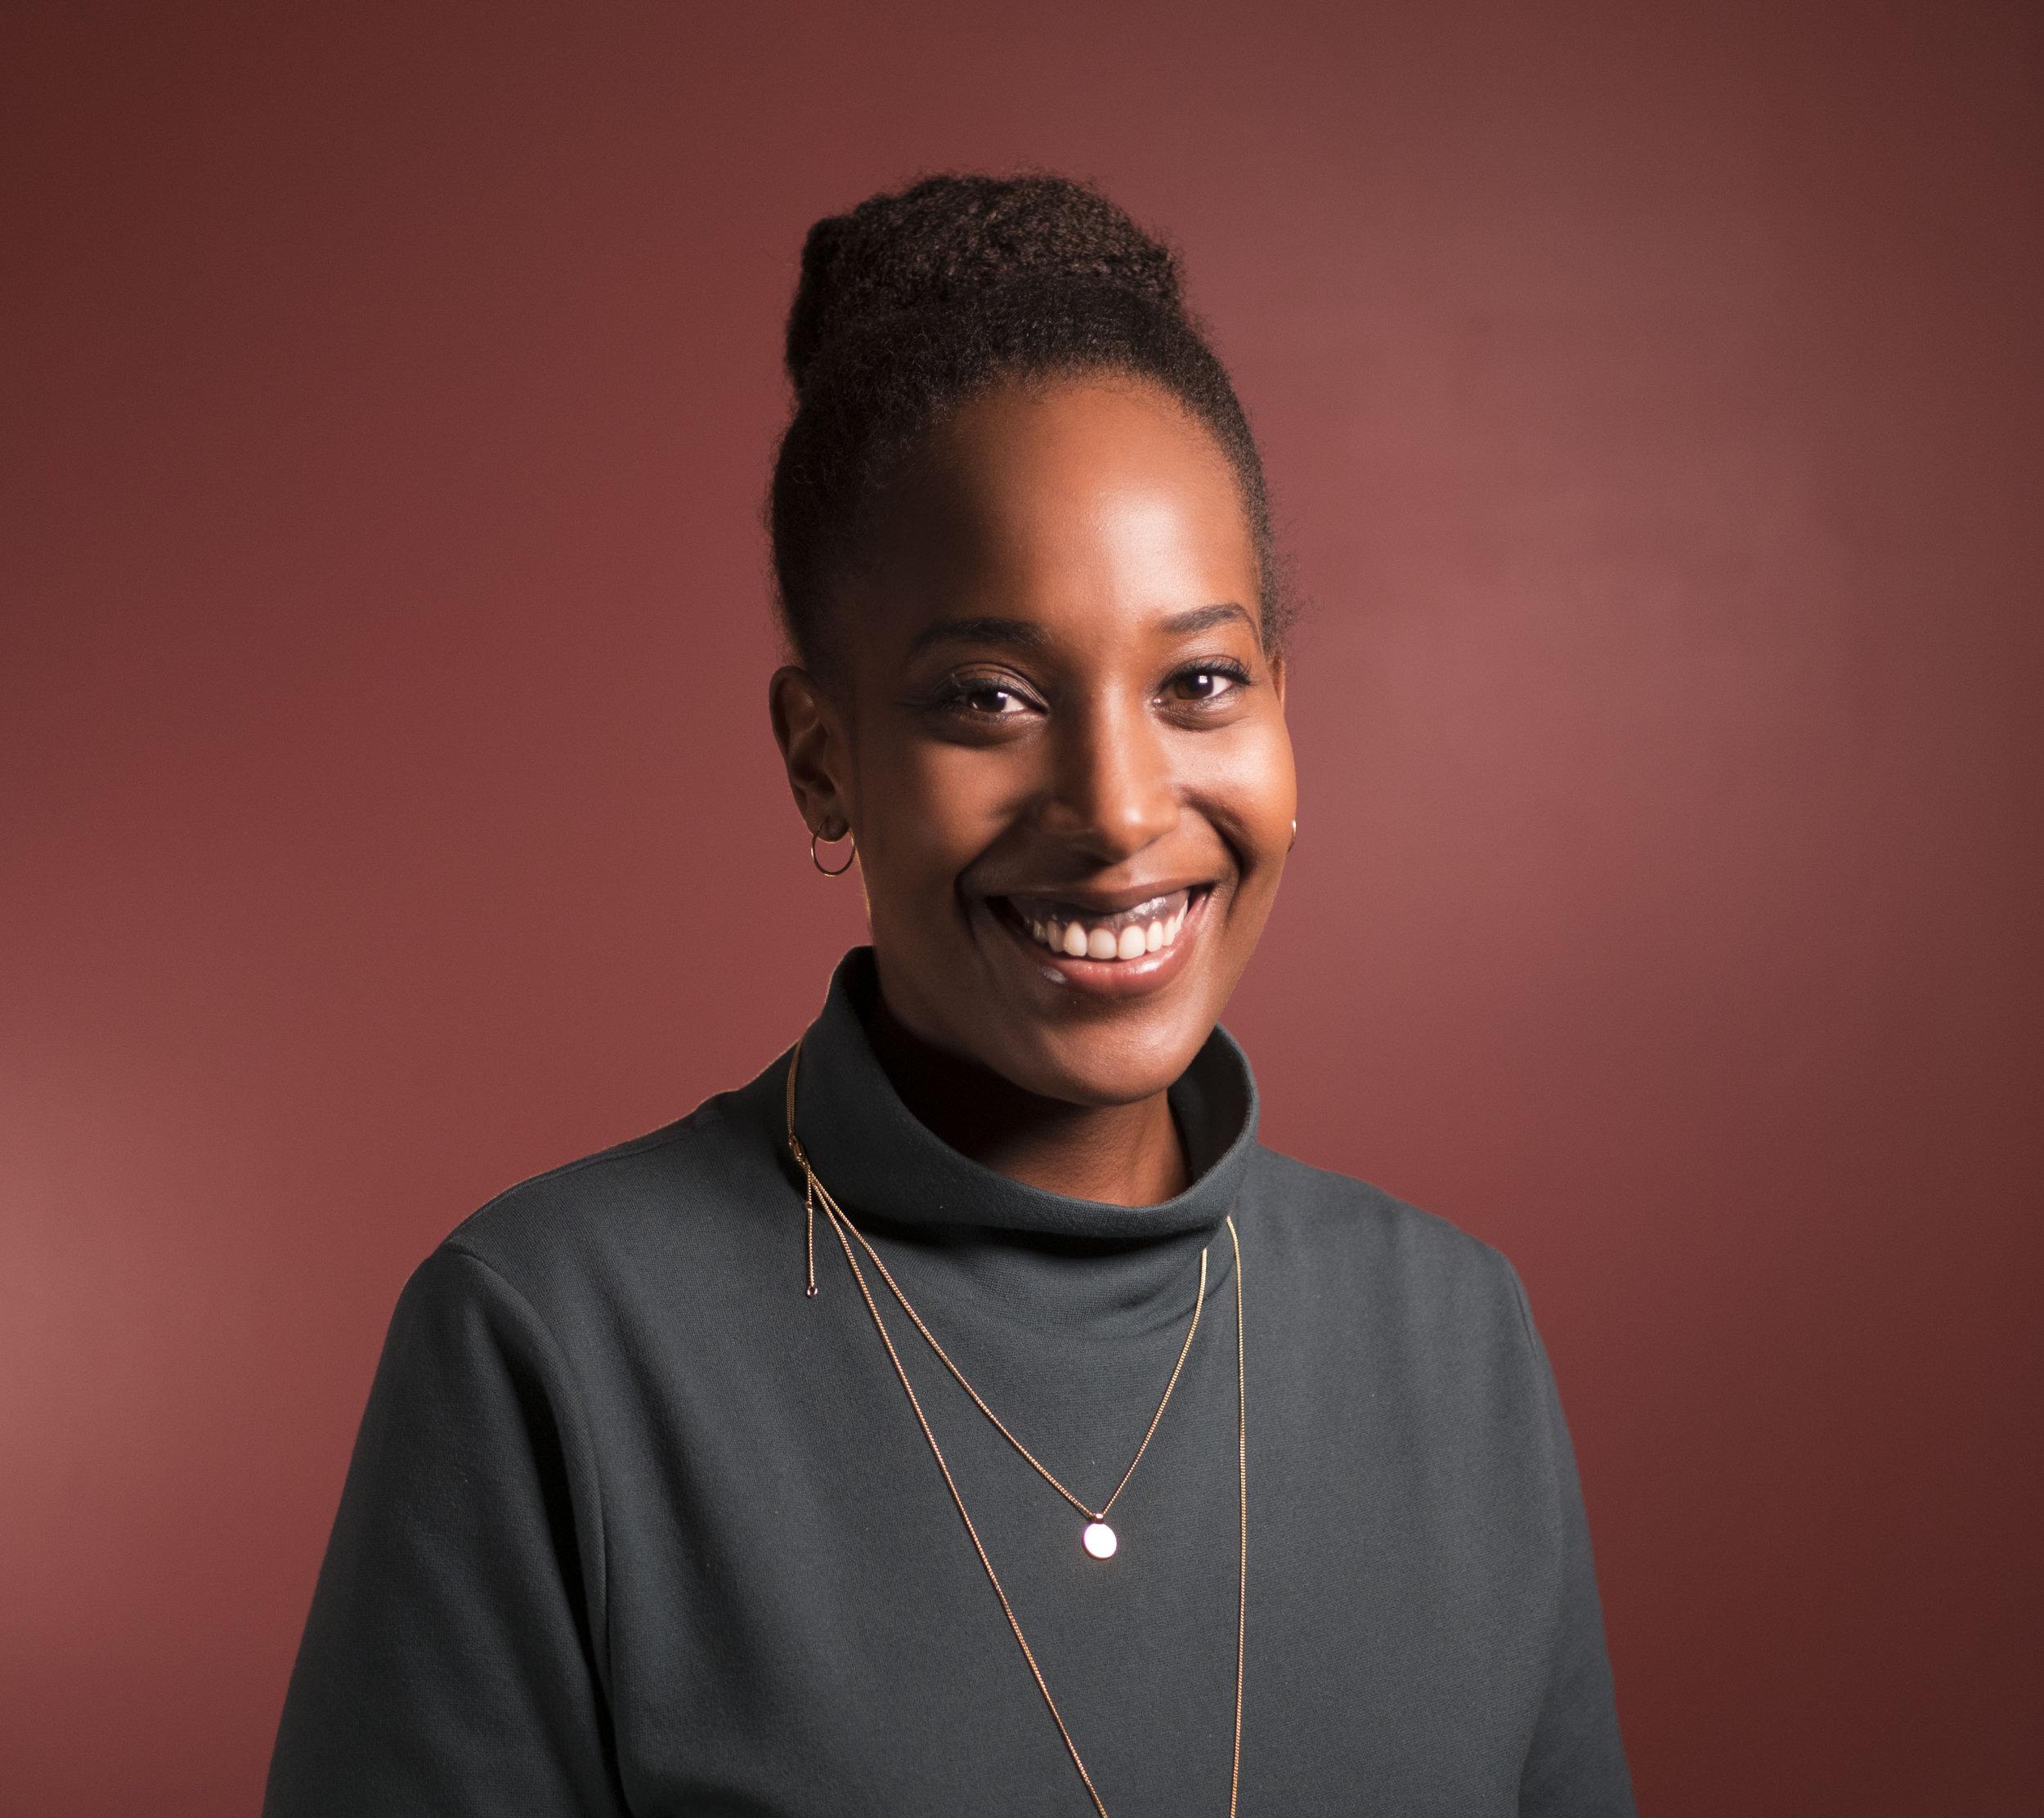 Samali Bikangaga / Assistant Editor